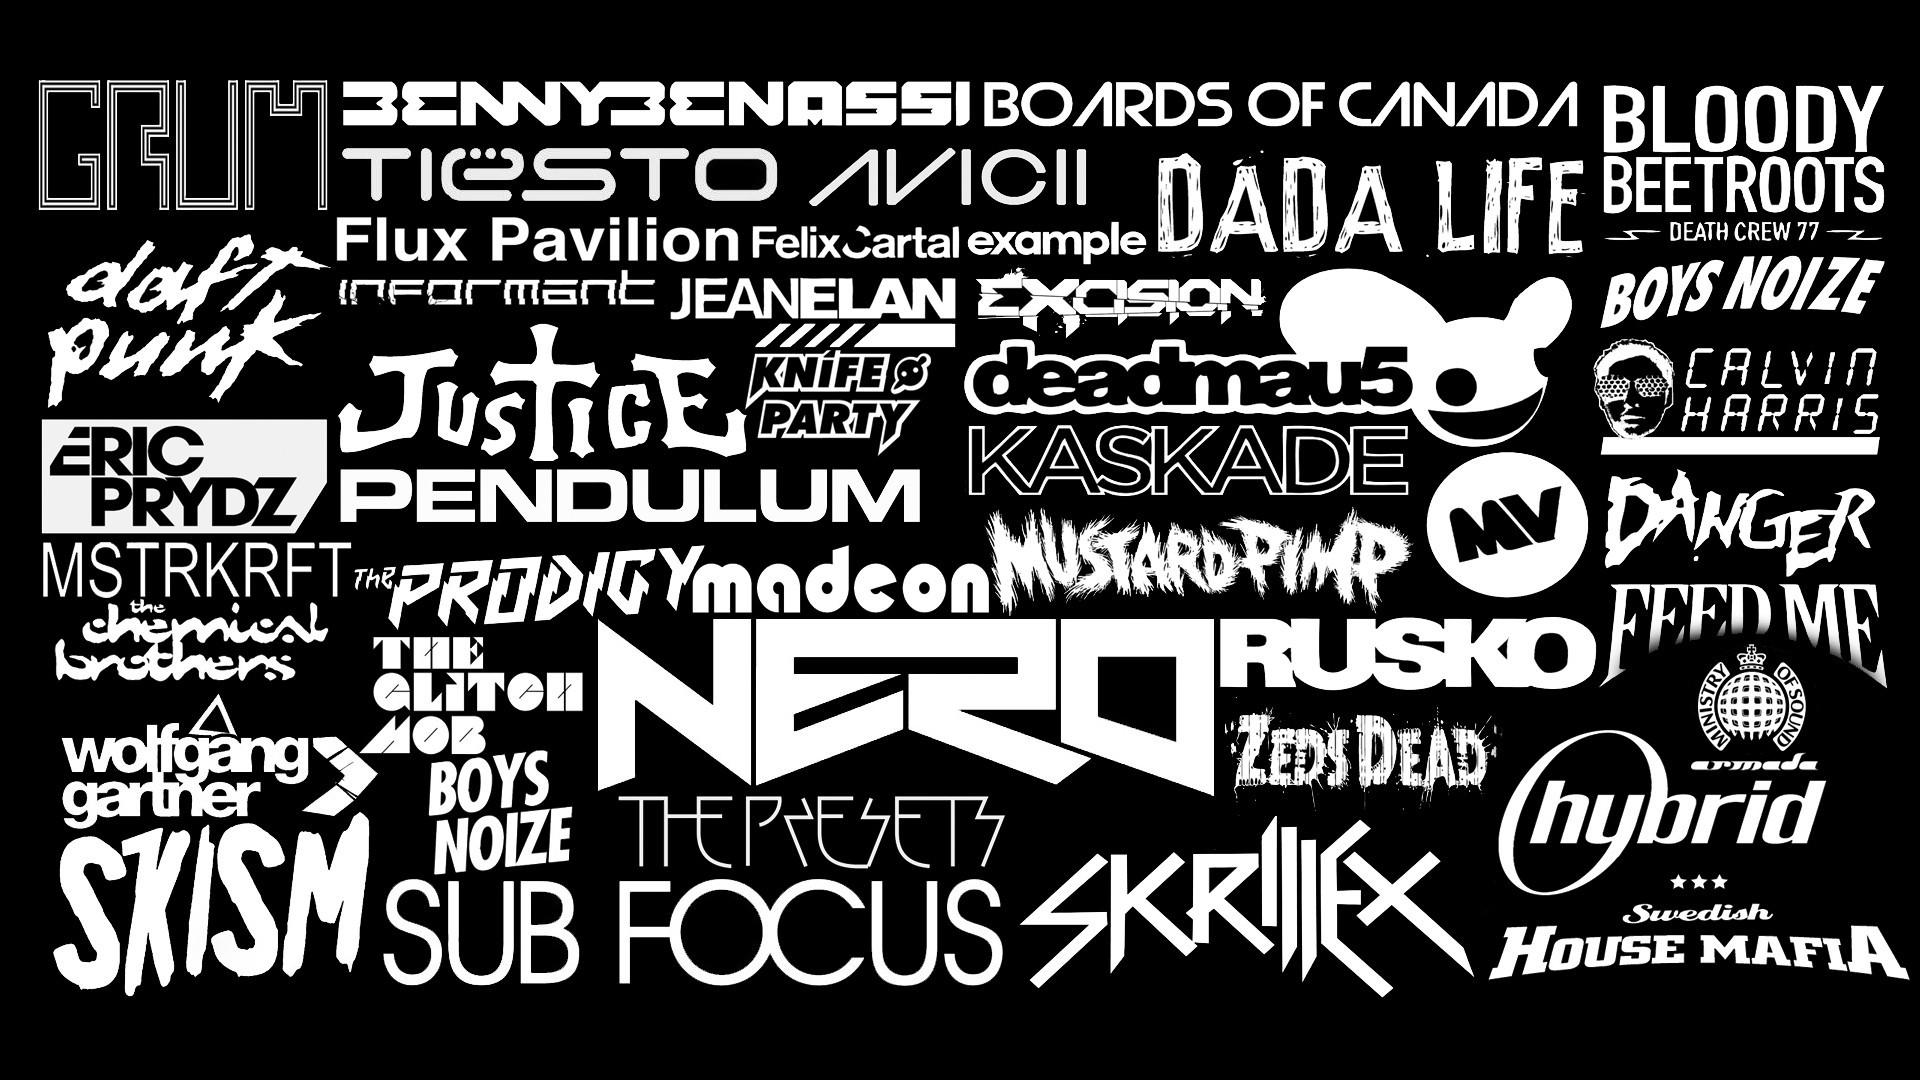 wallpaper : text, brand, djs, dj king, advertising, 1920x1080 px